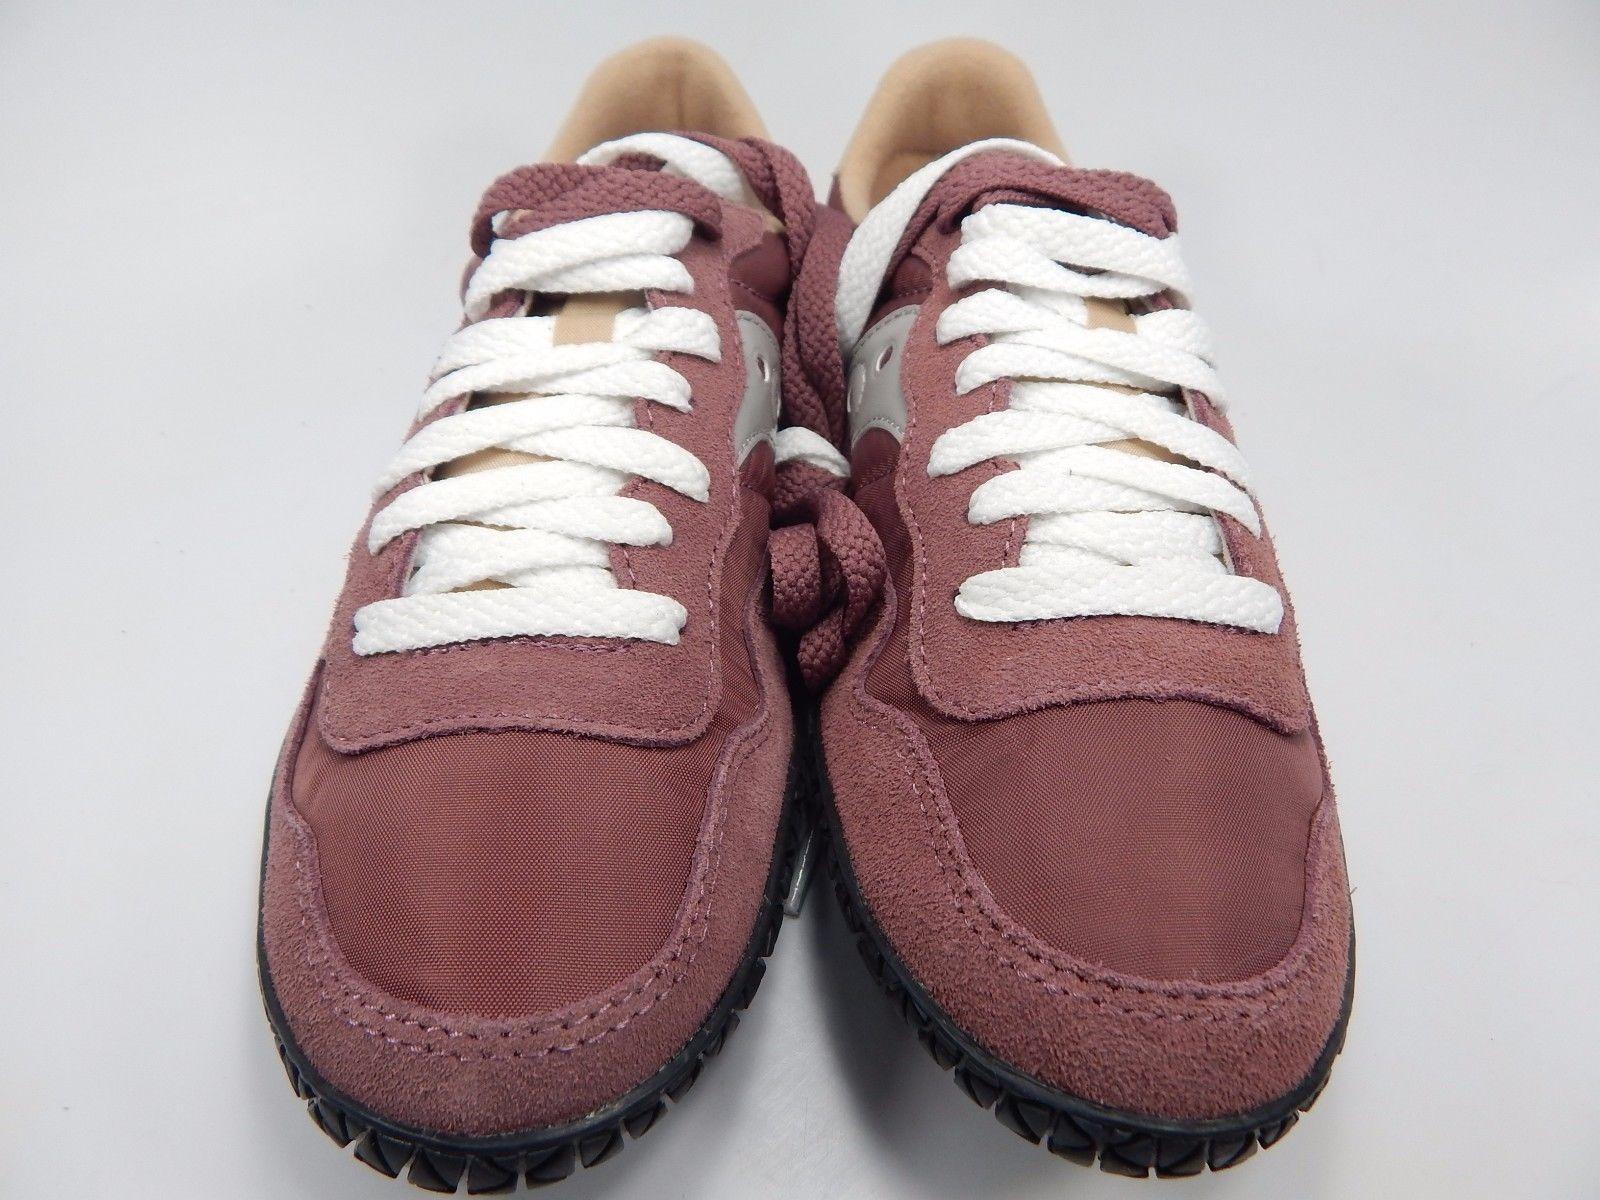 Saucony Original Bullet Women's Running Shoes Sz 7 M (B) EU 38 Maroon S1943-167